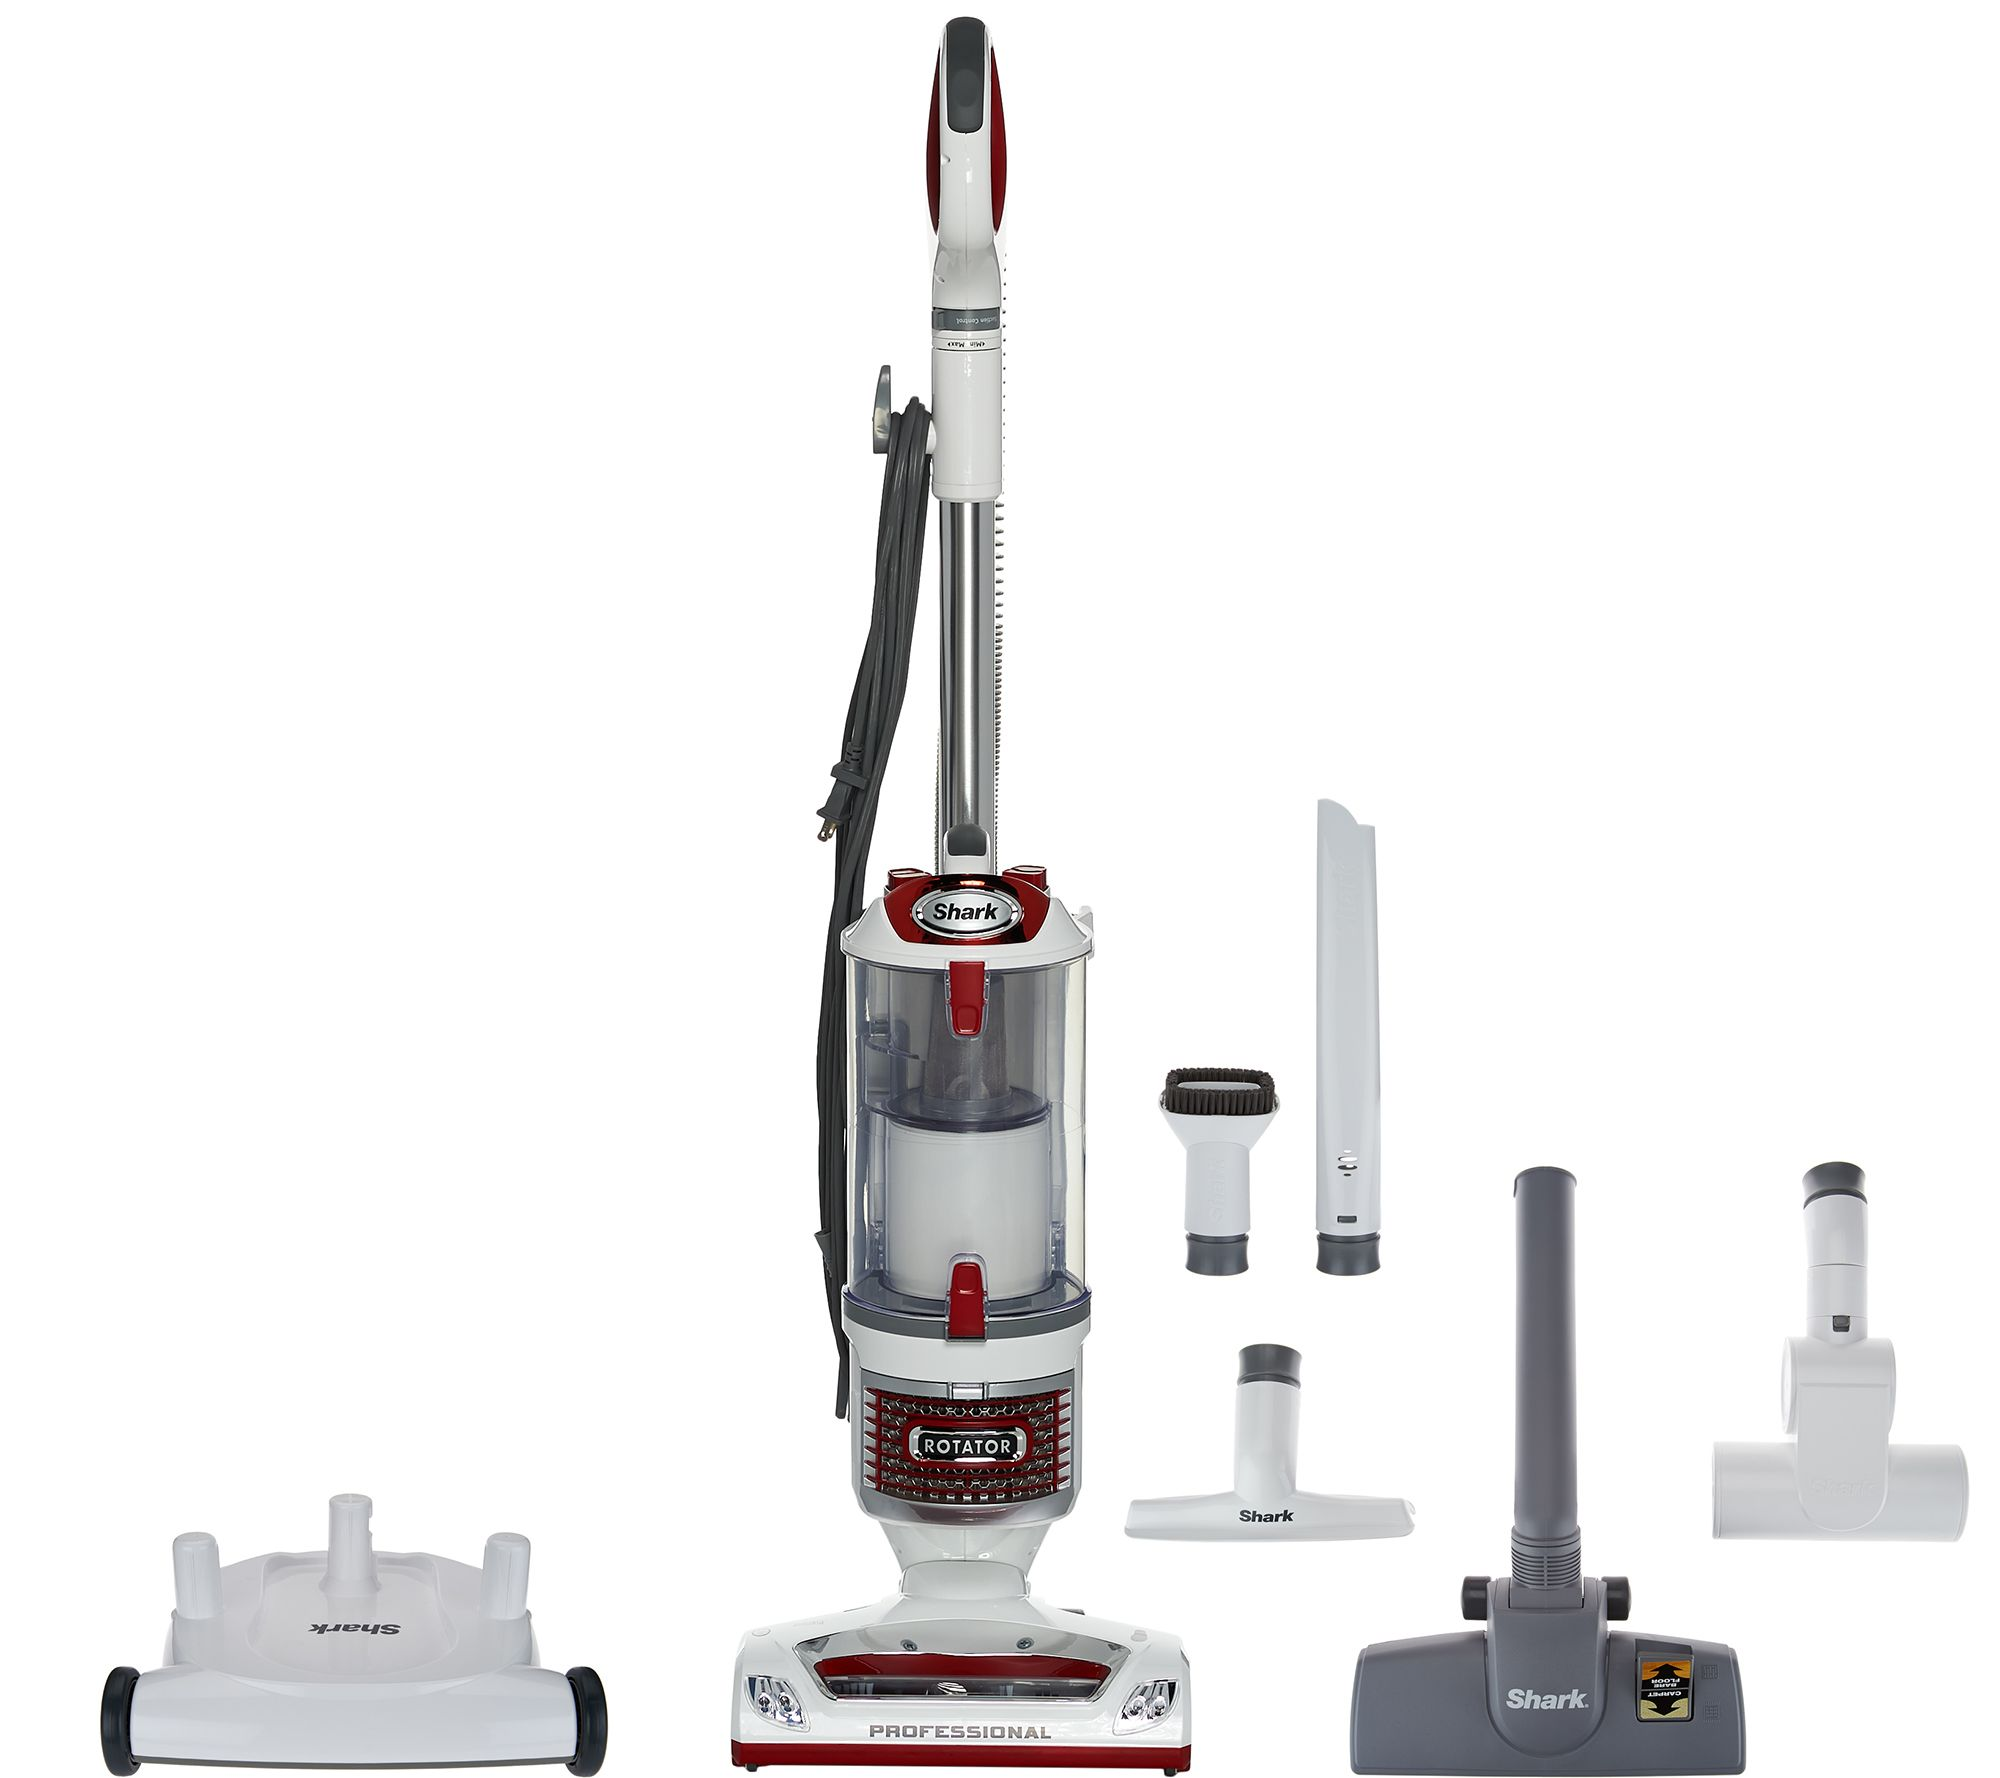 Shark Rotator Professional 3in1 Liftaway Upright Vacuum